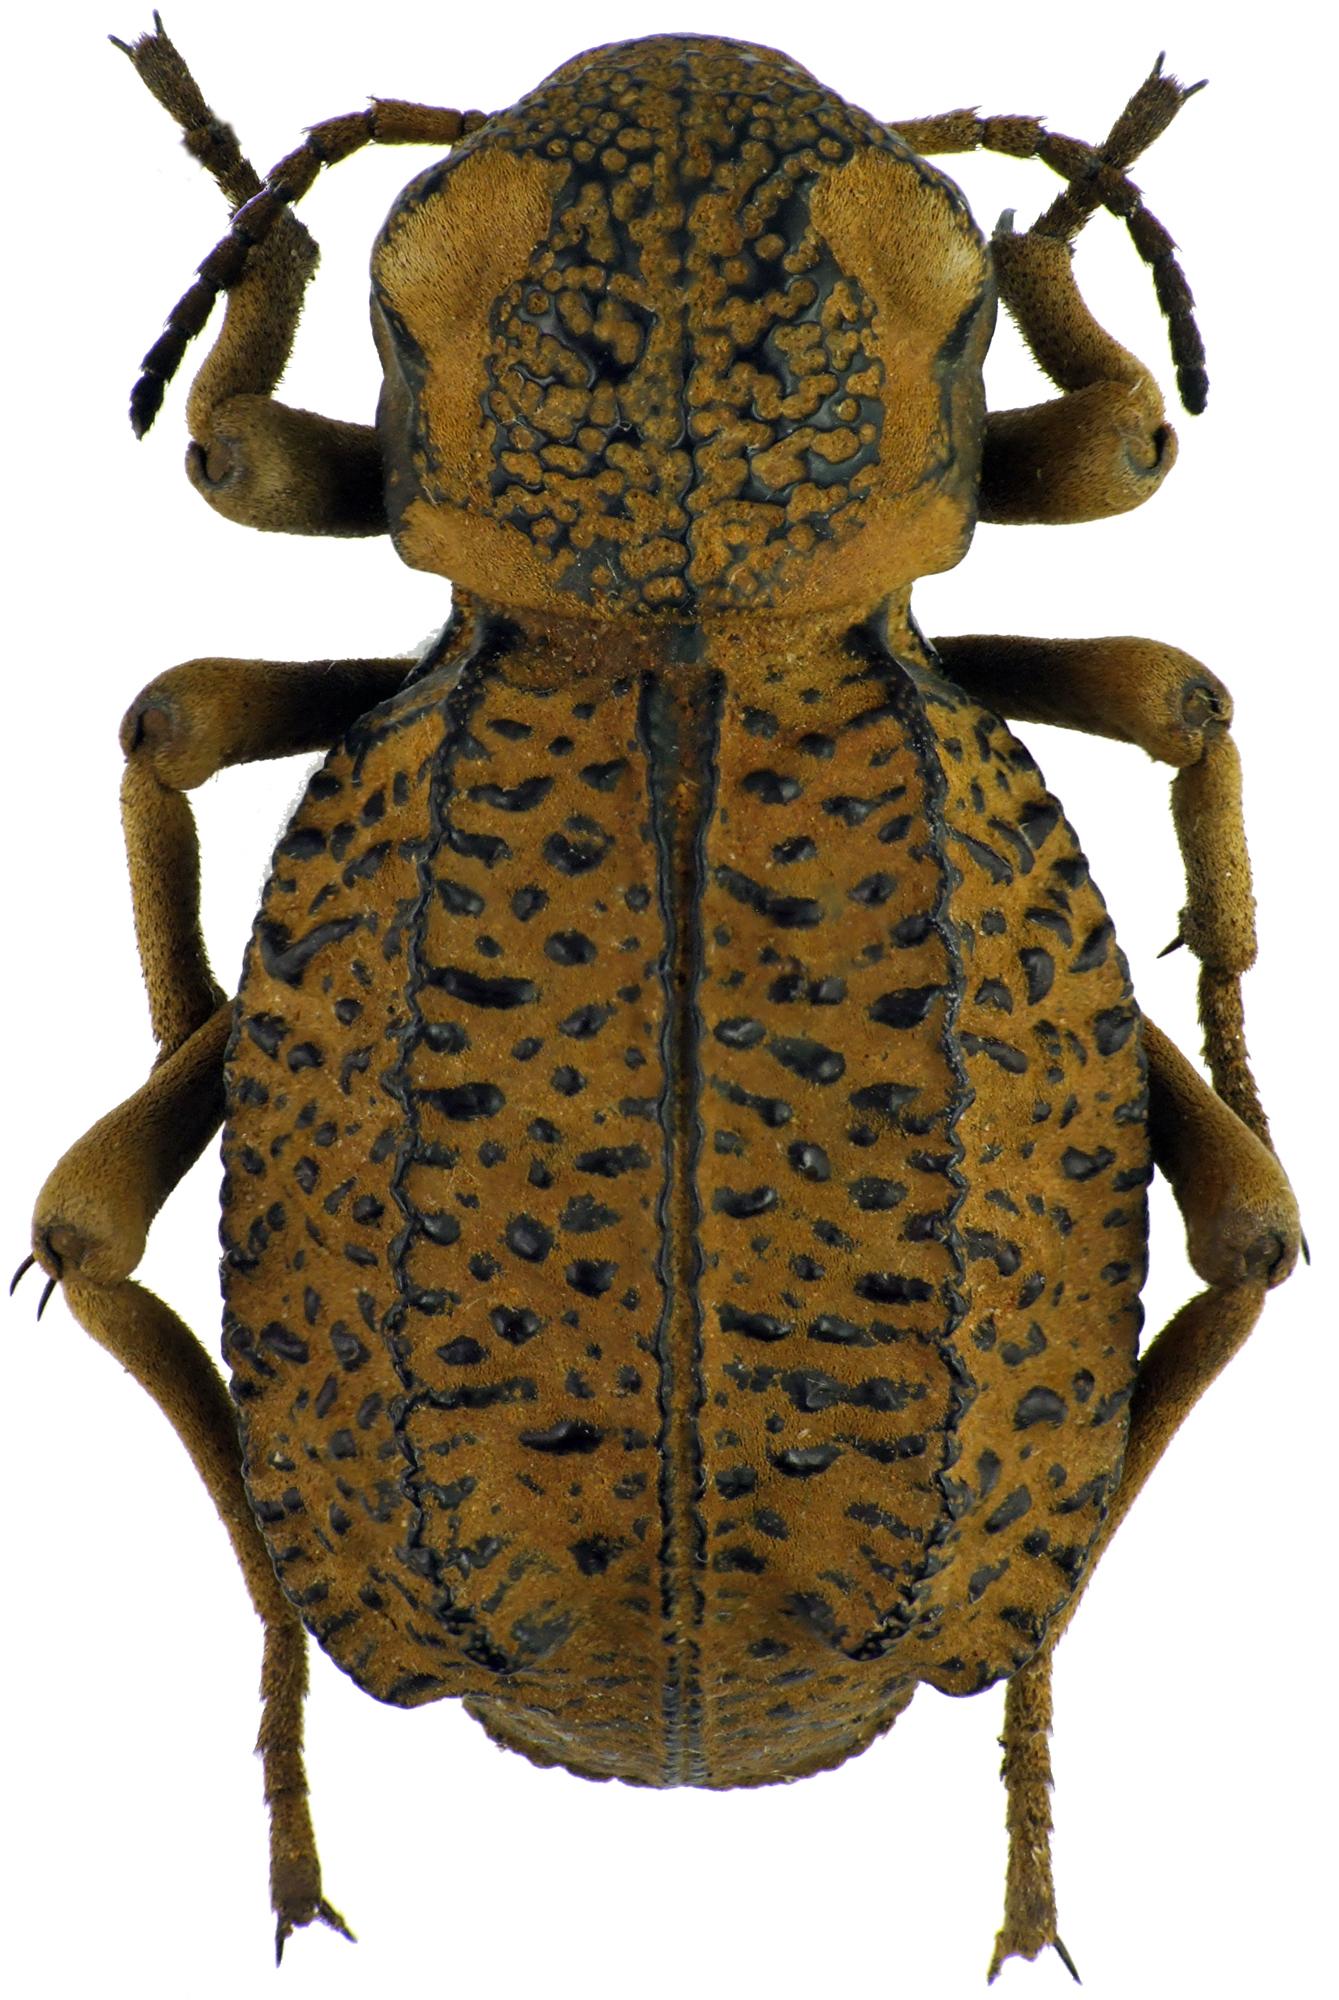 Brachyphrynus petrosus petrosus 71175cz84.jpg